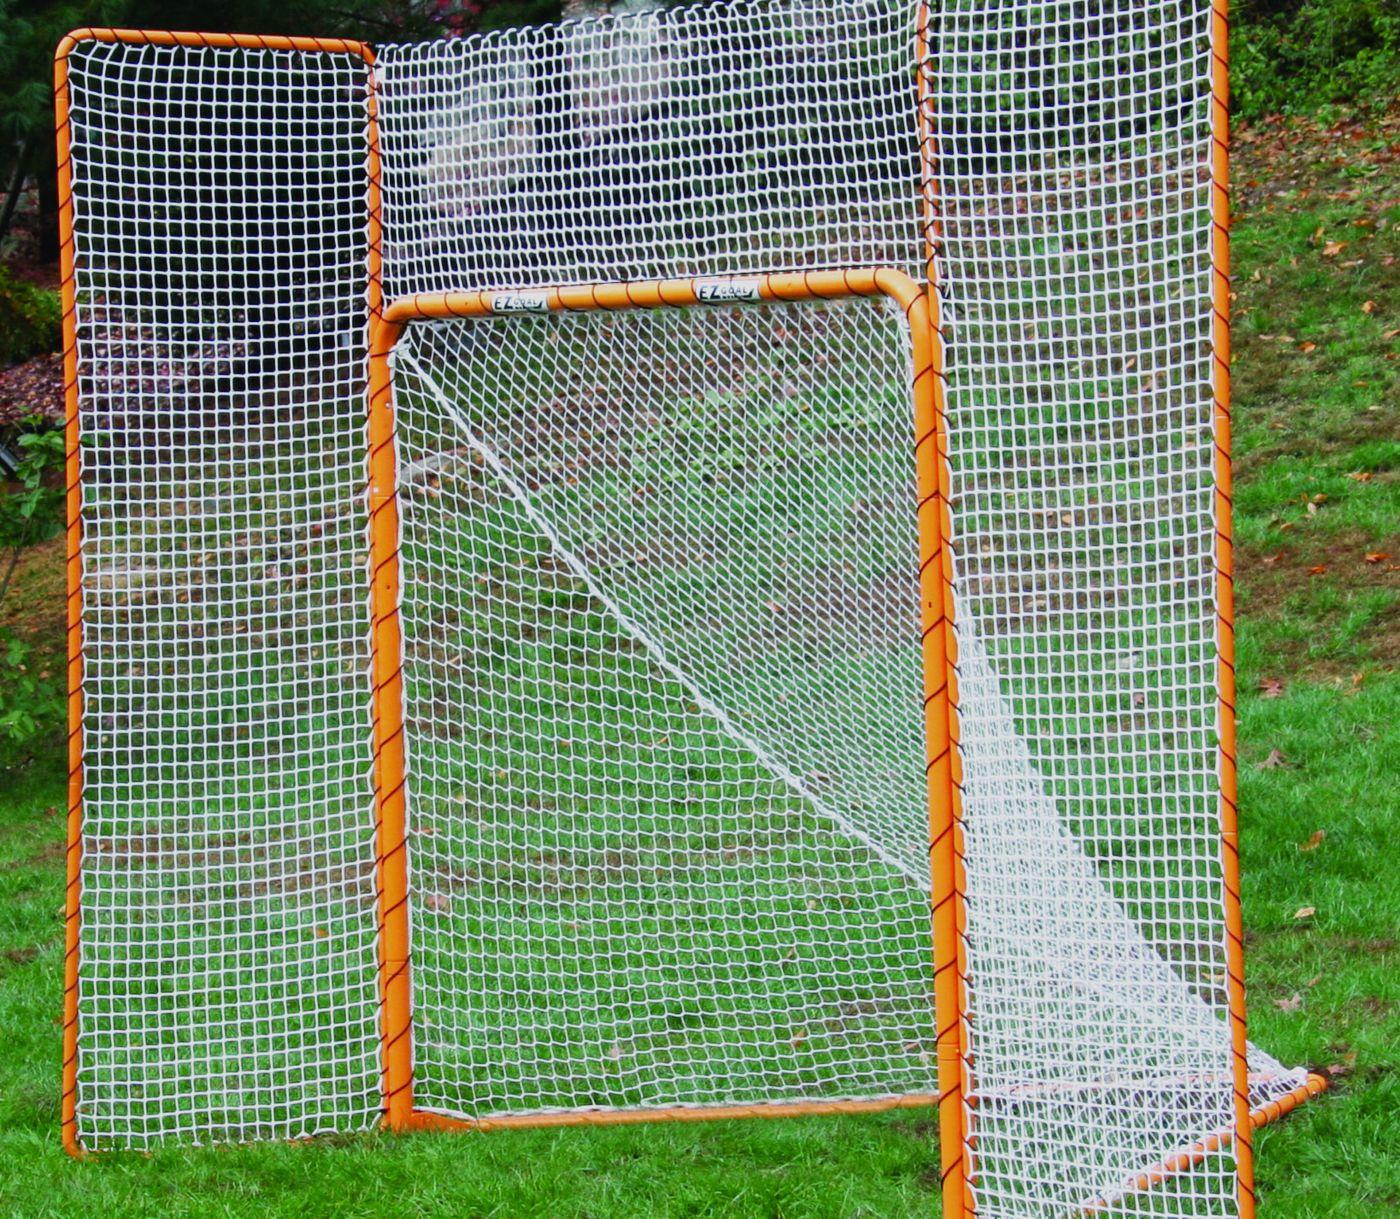 EZ Goal Monster Lacrosse Goal with Backstop